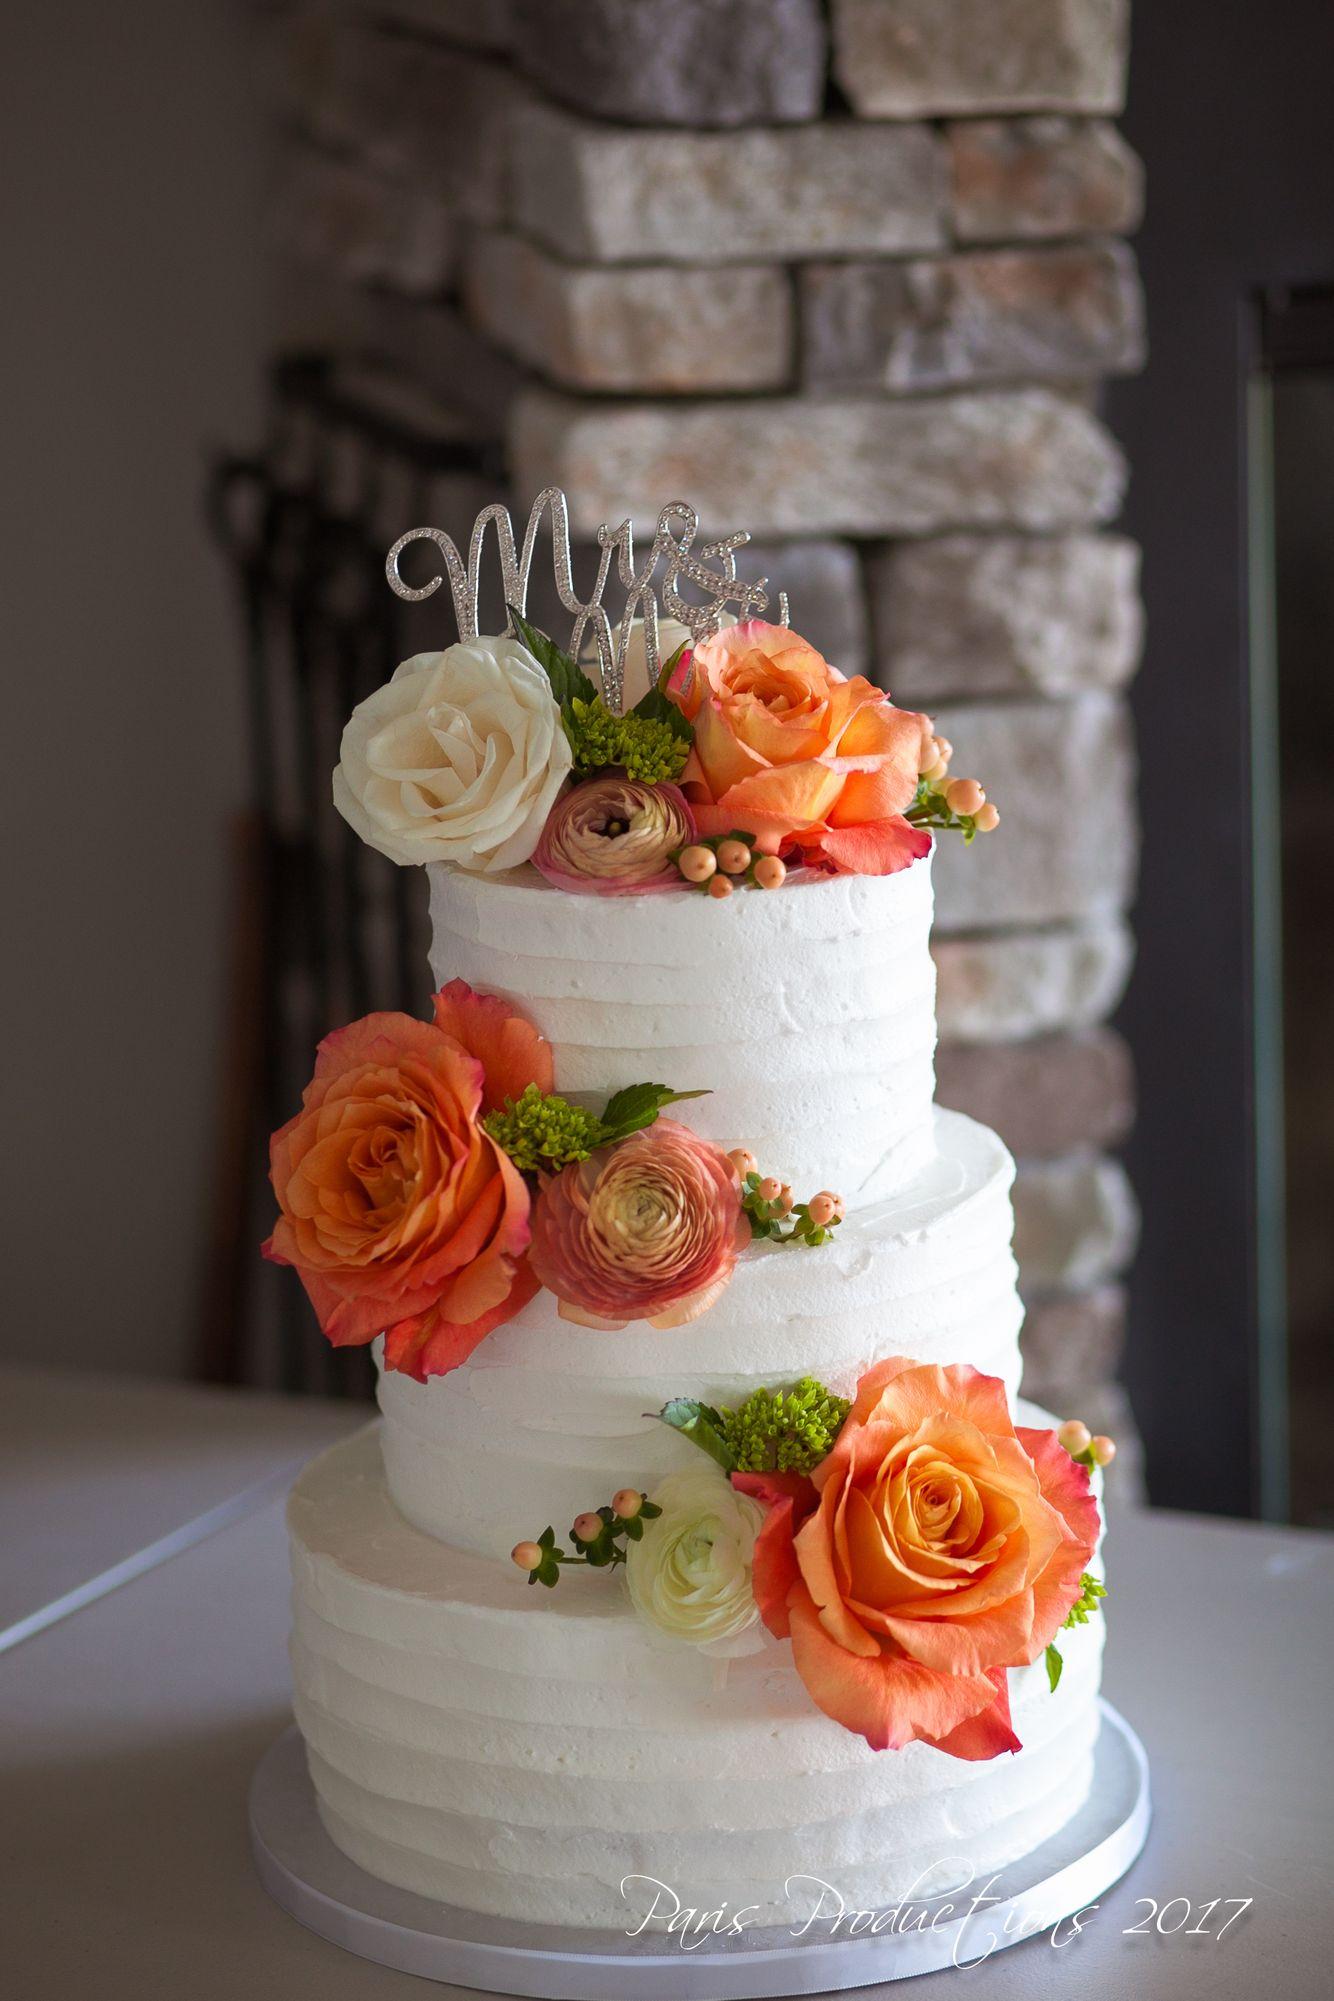 Rustic and Romantic Wedding Cake